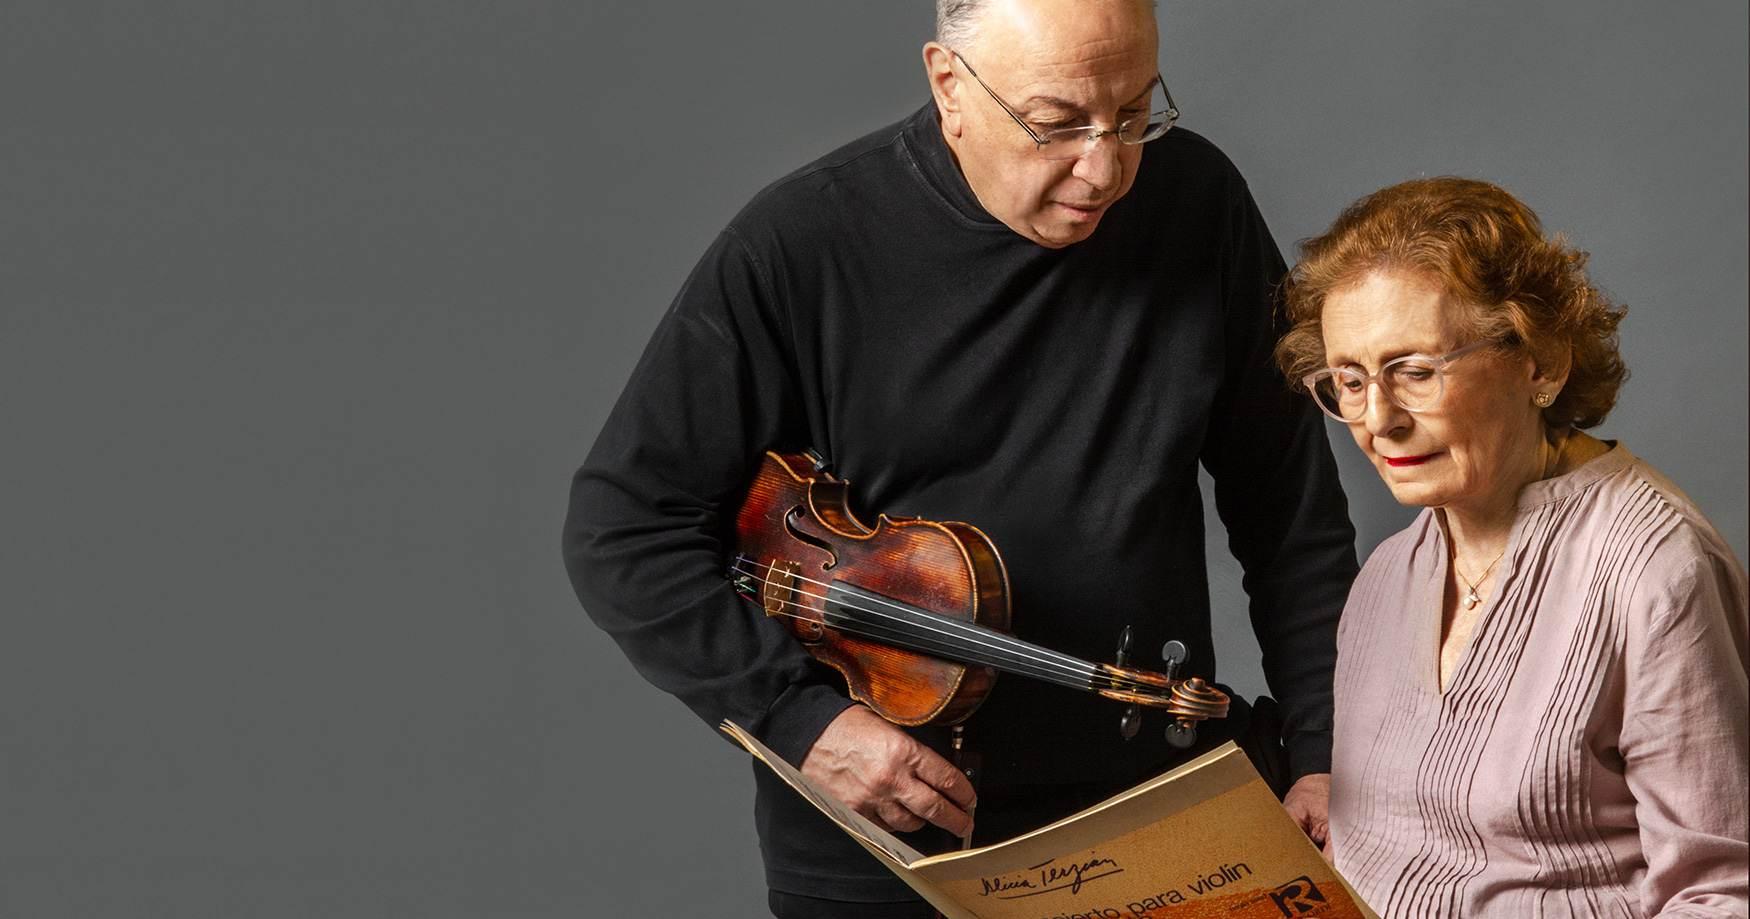 Composer Alicia Terzian with violinist Rafael Gintoli